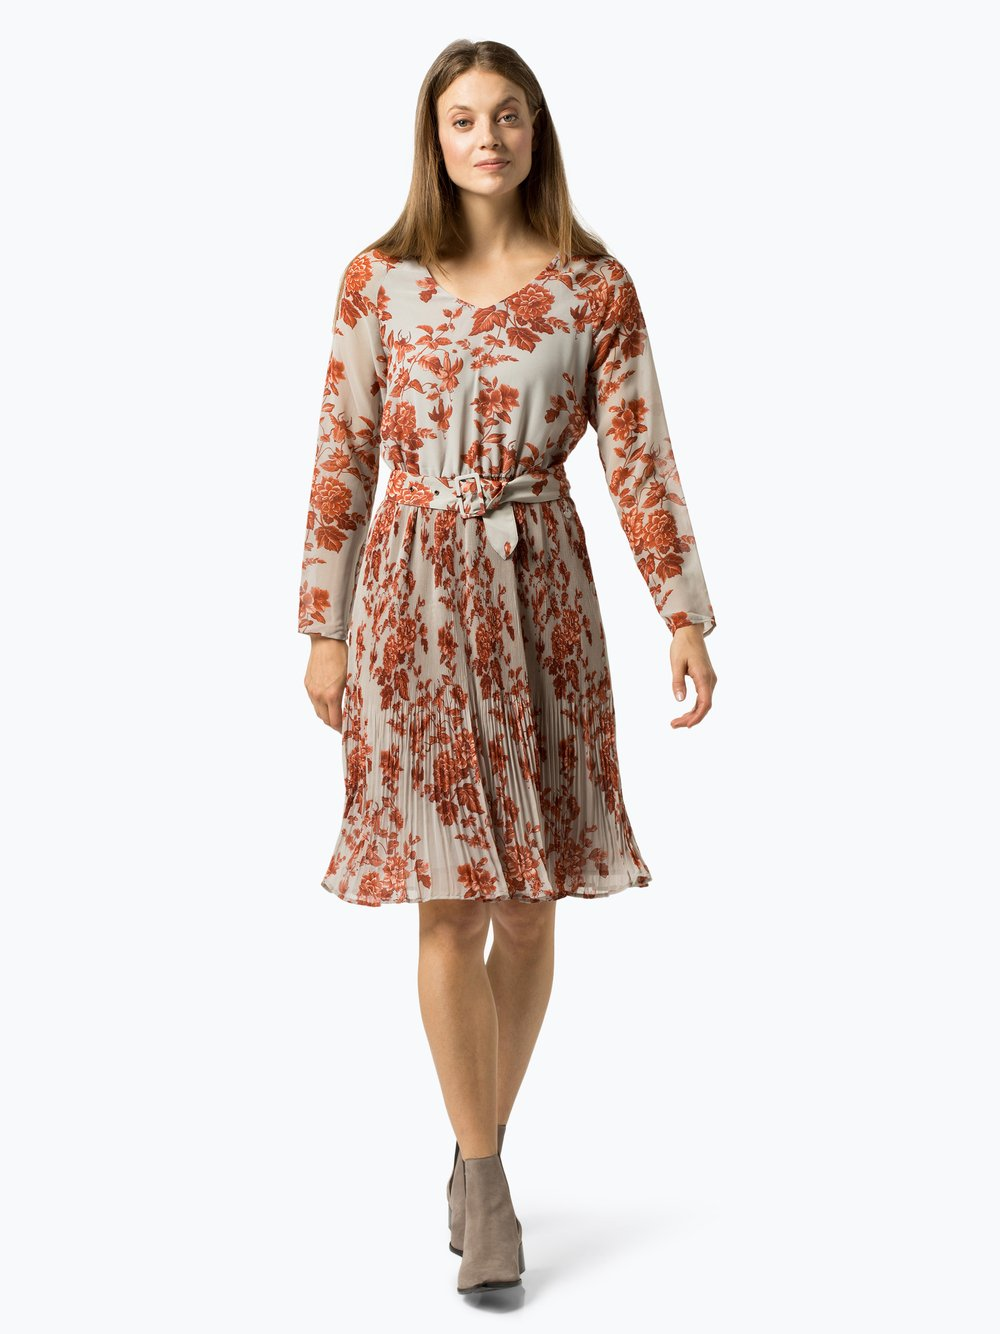 Pepe Jeans Damen Kleid Natasha online kaufen   VANGRAAF.COM